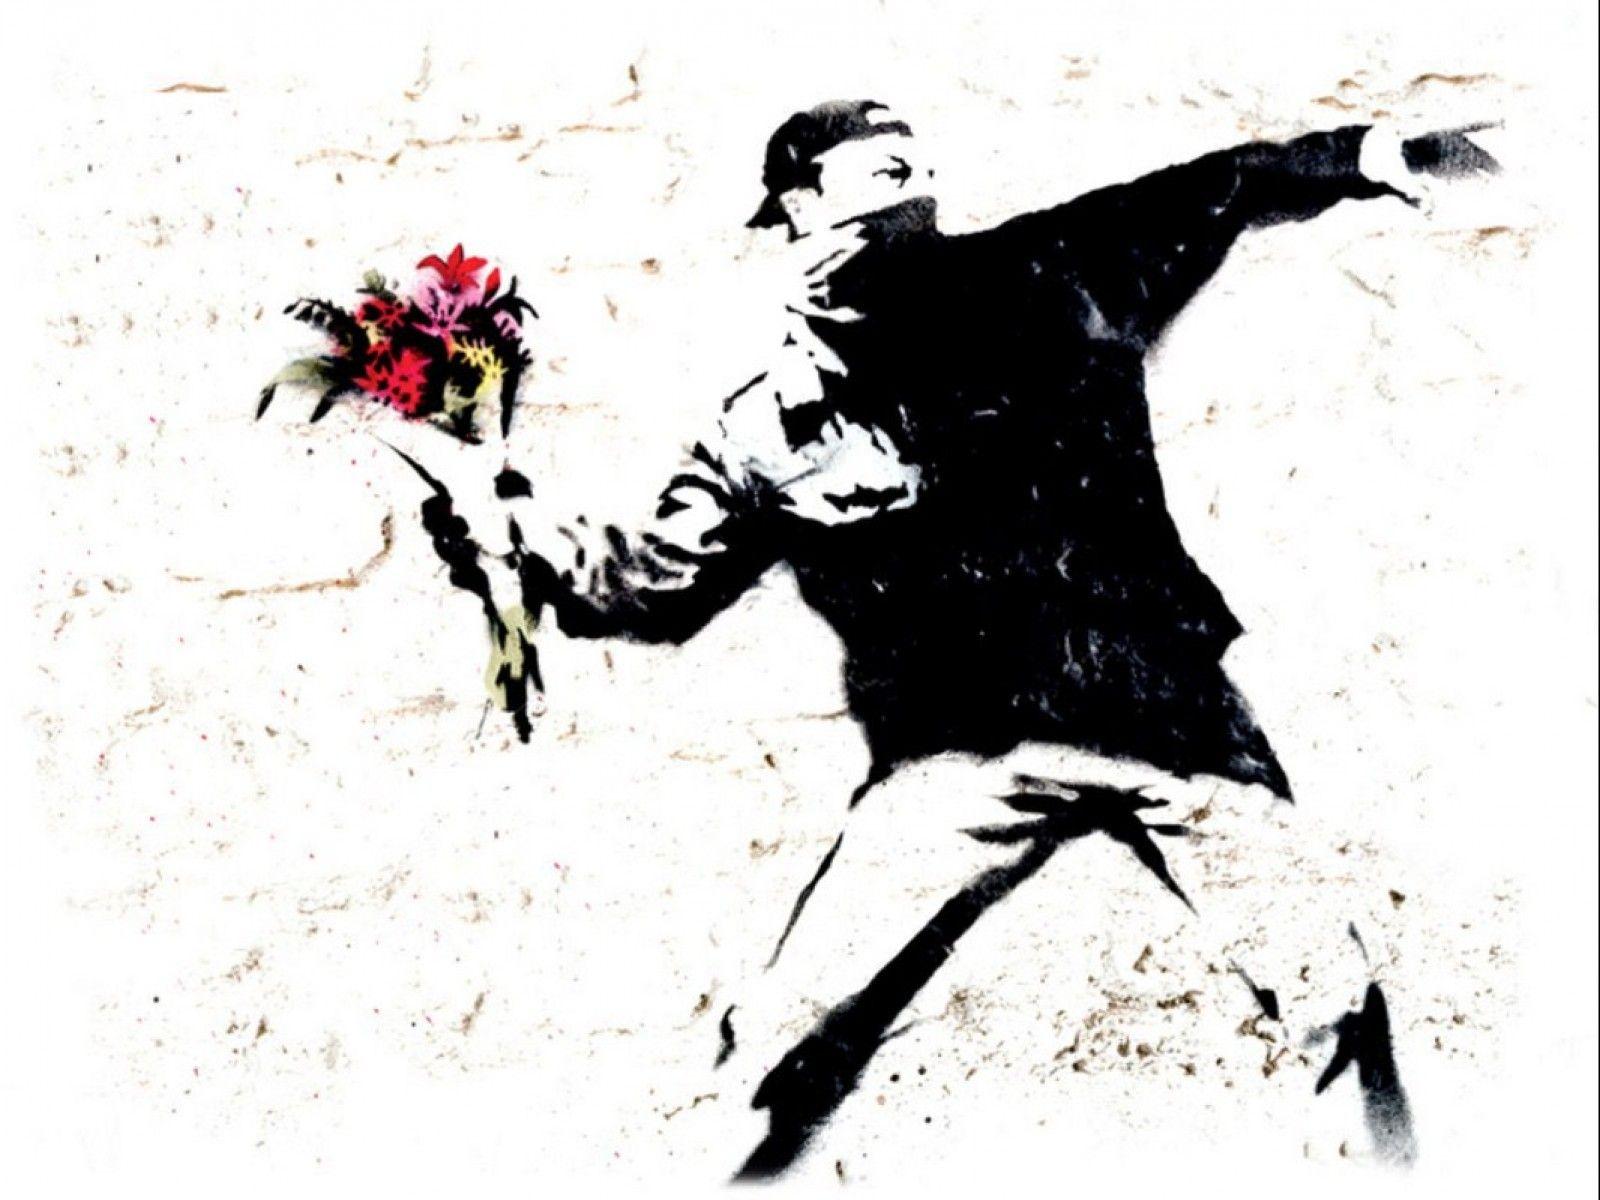 72 Banksy Hd Wallpaper On Wallpapersafari